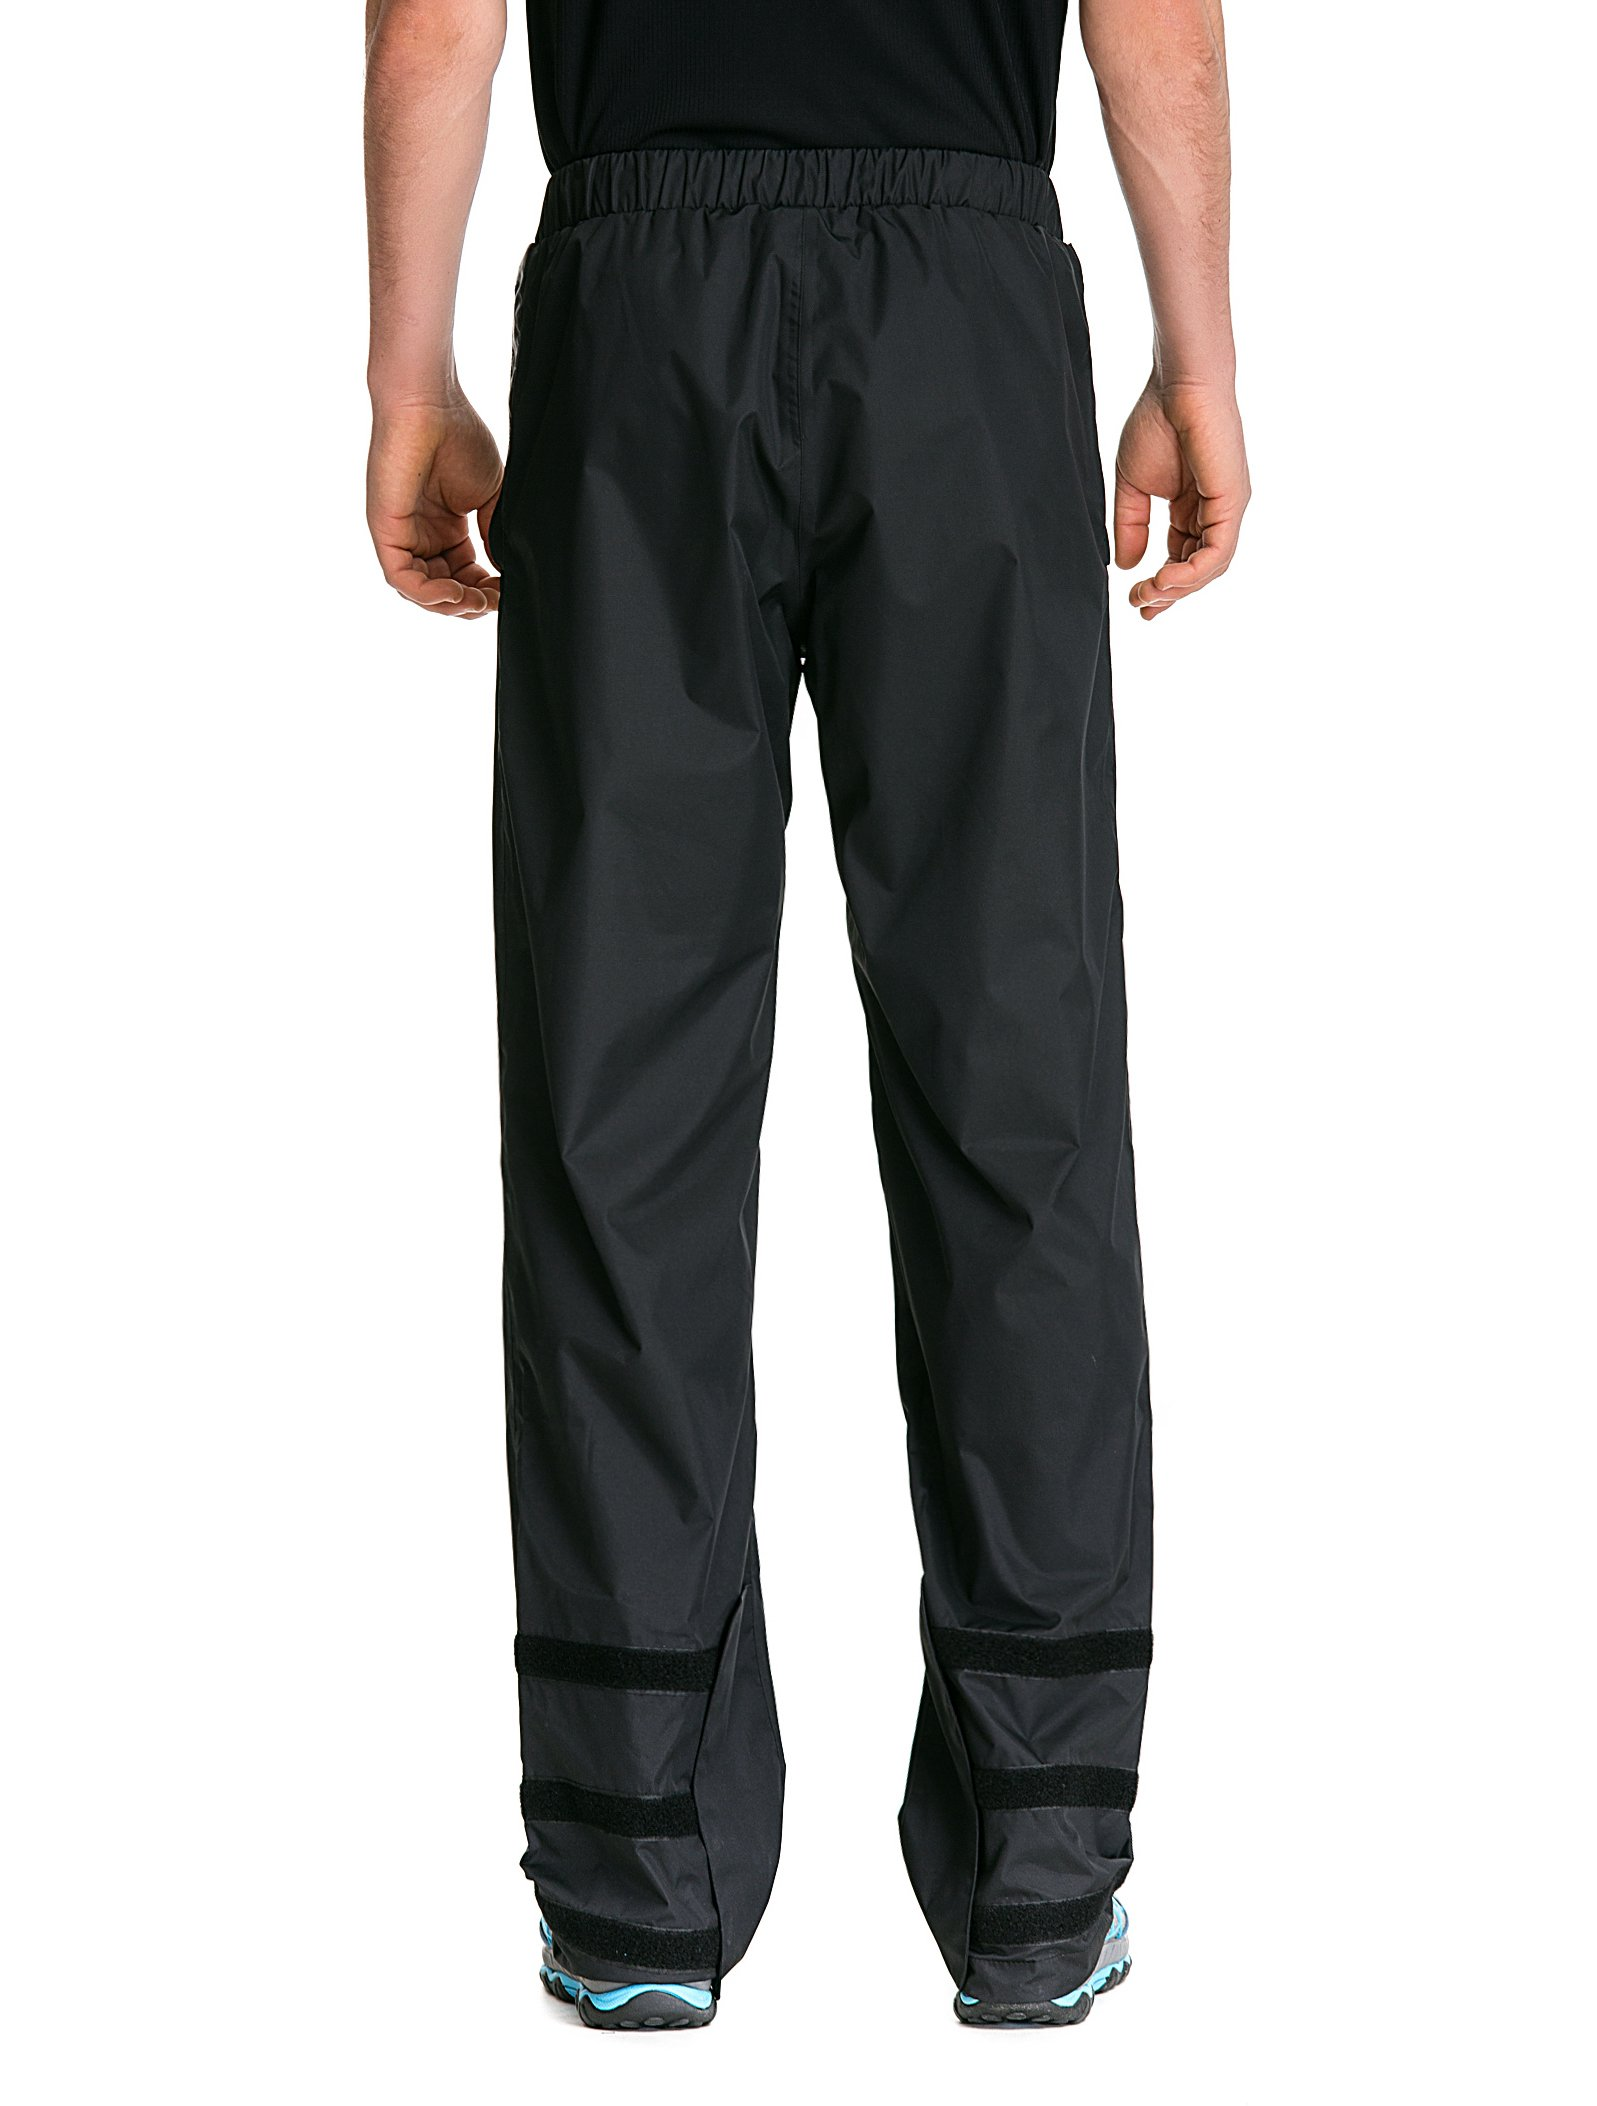 Trailside Supply Co. Men's Waterproof Windproof Elastic-Waist Rain Pants (Black,X-Large) by Trailside Supply Co. (Image #6)